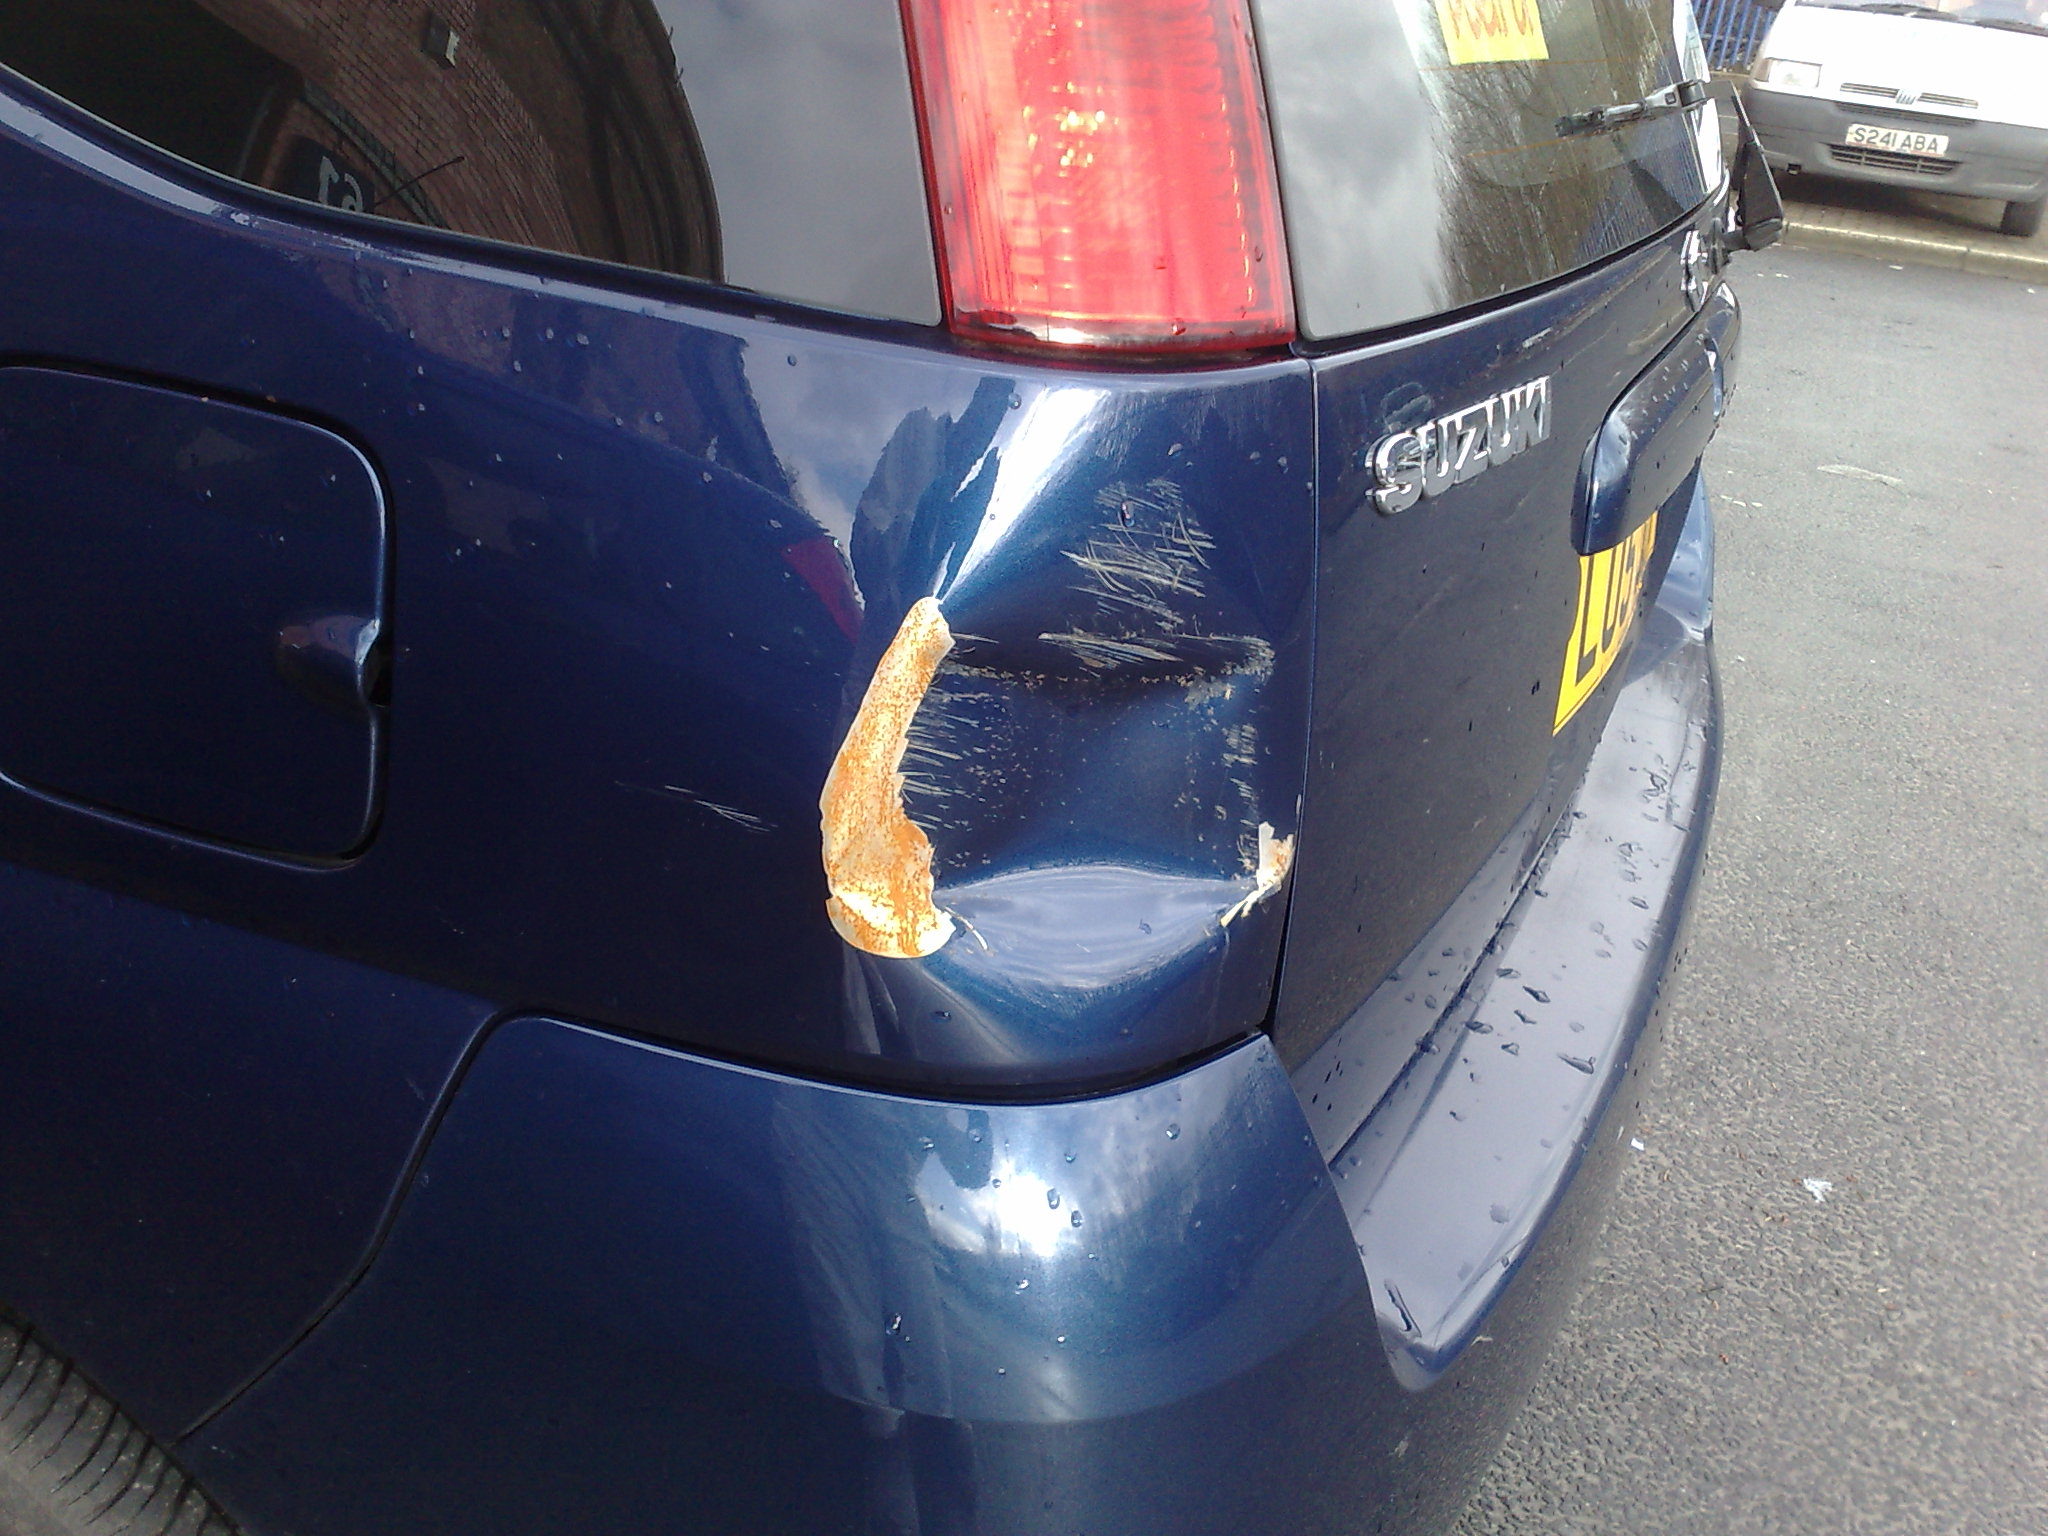 Repainting A Car Cost Uk